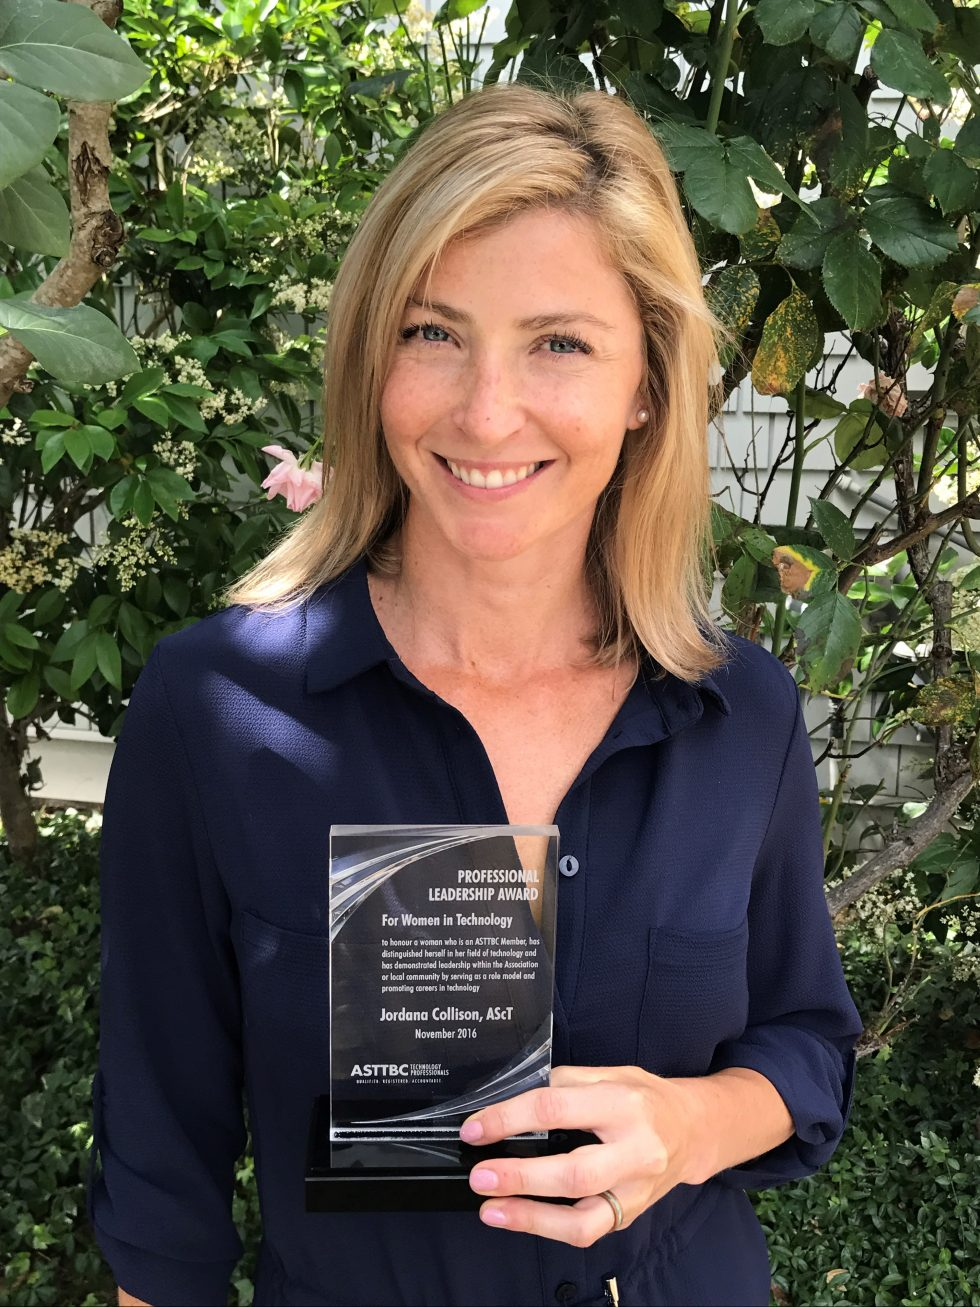 ASTTBC Professional Leadership Award